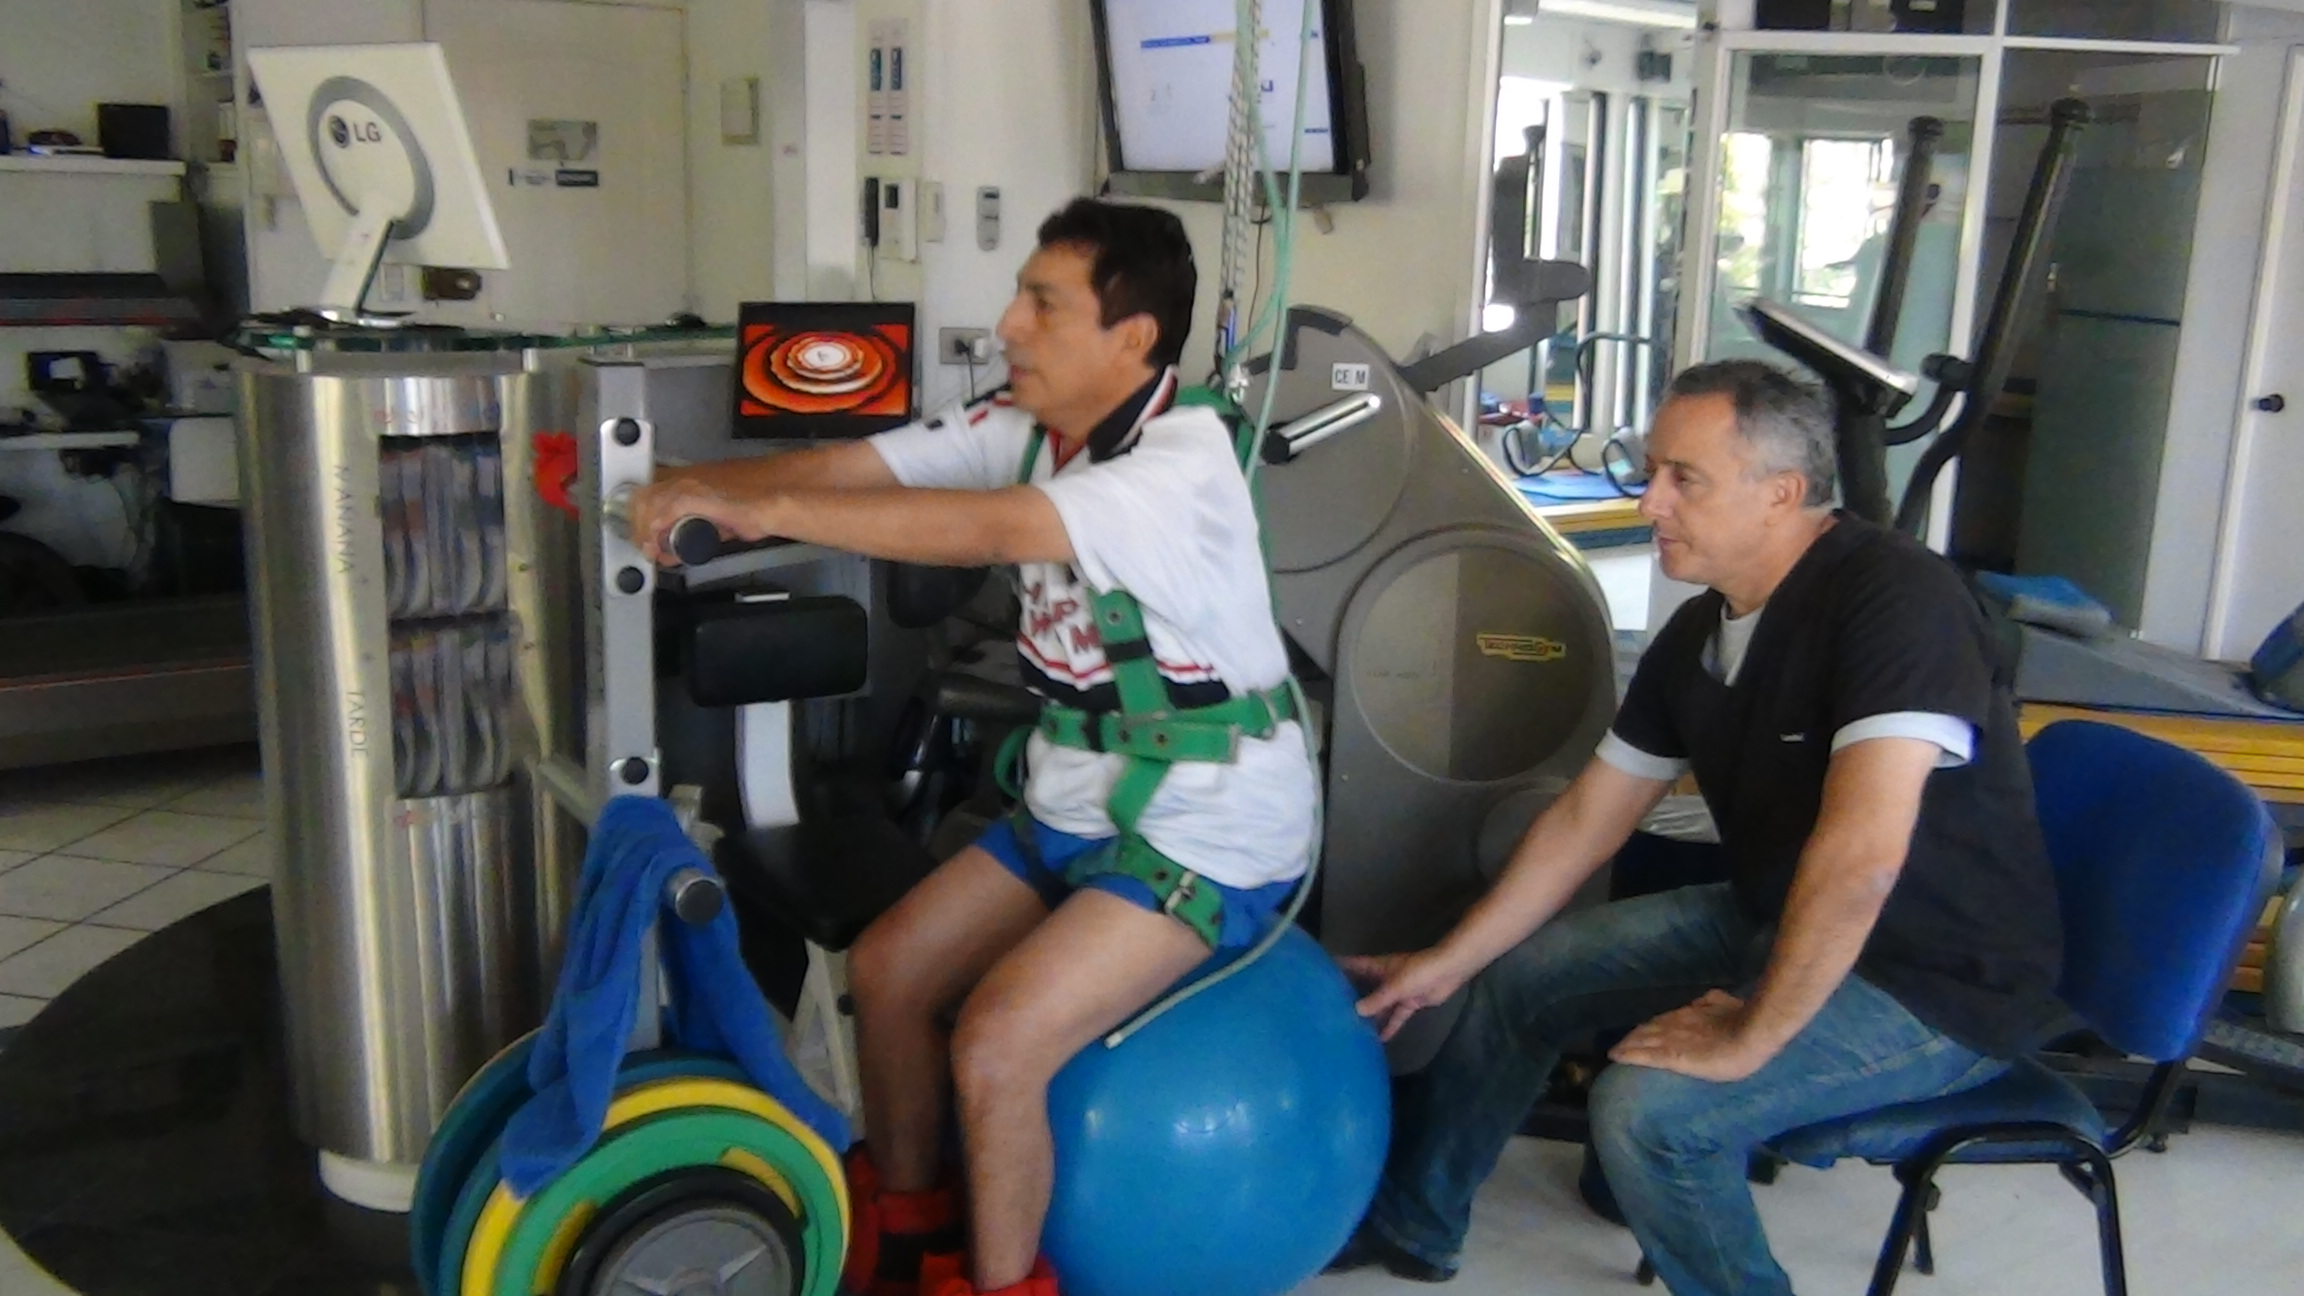 kinesiologia - rehabilitacion - clinica de ejercicio kw - la reina.JPG